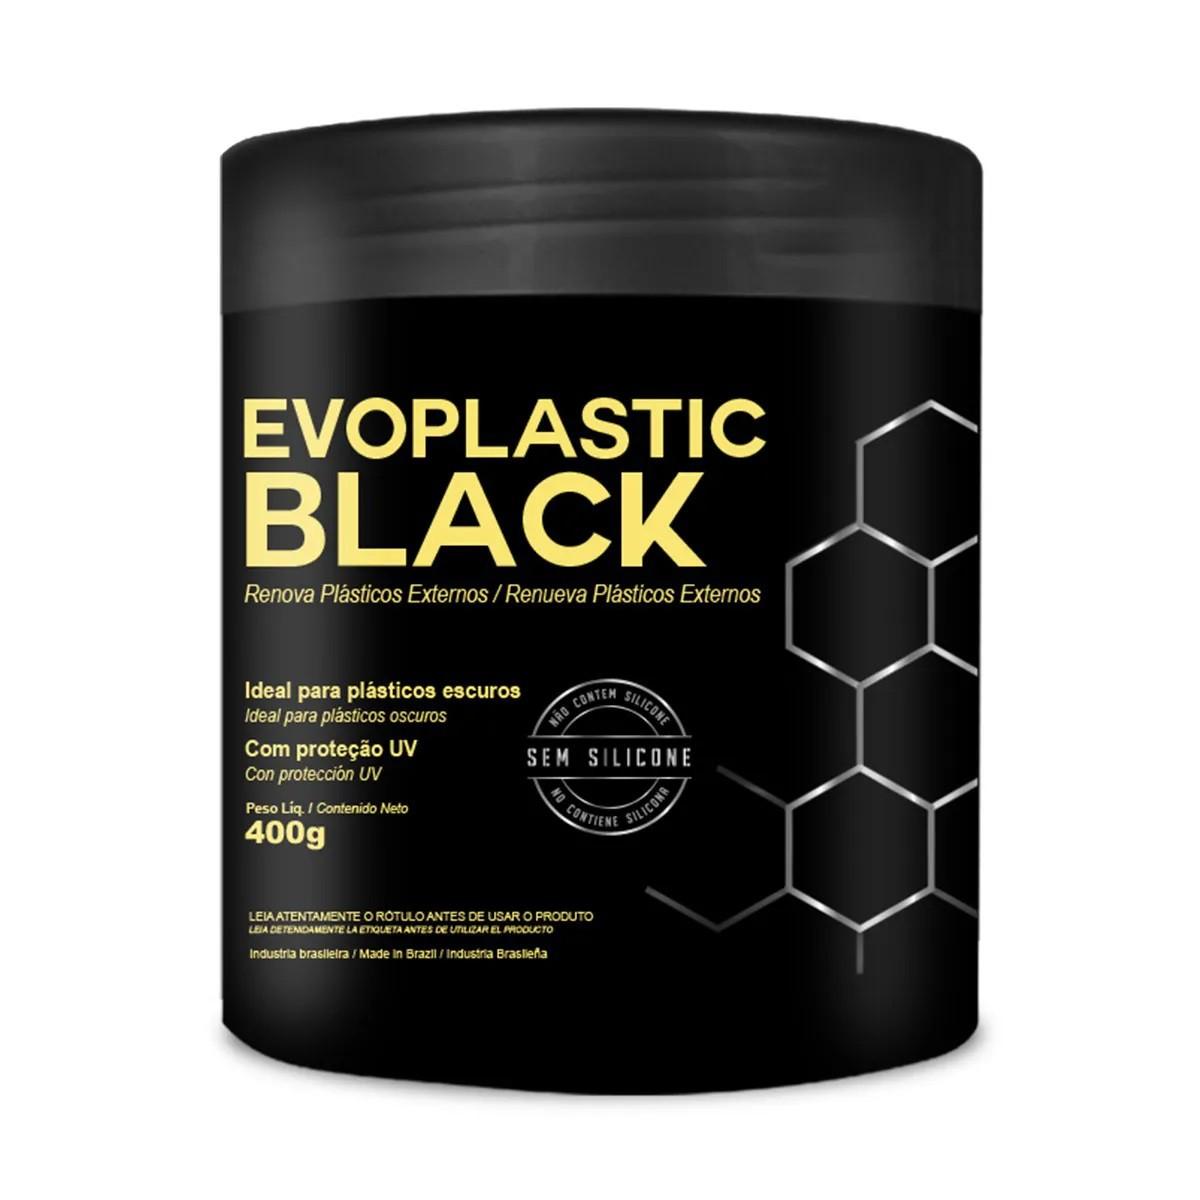 Renova Plásticos Externos 400g Evoplastic Black Evox